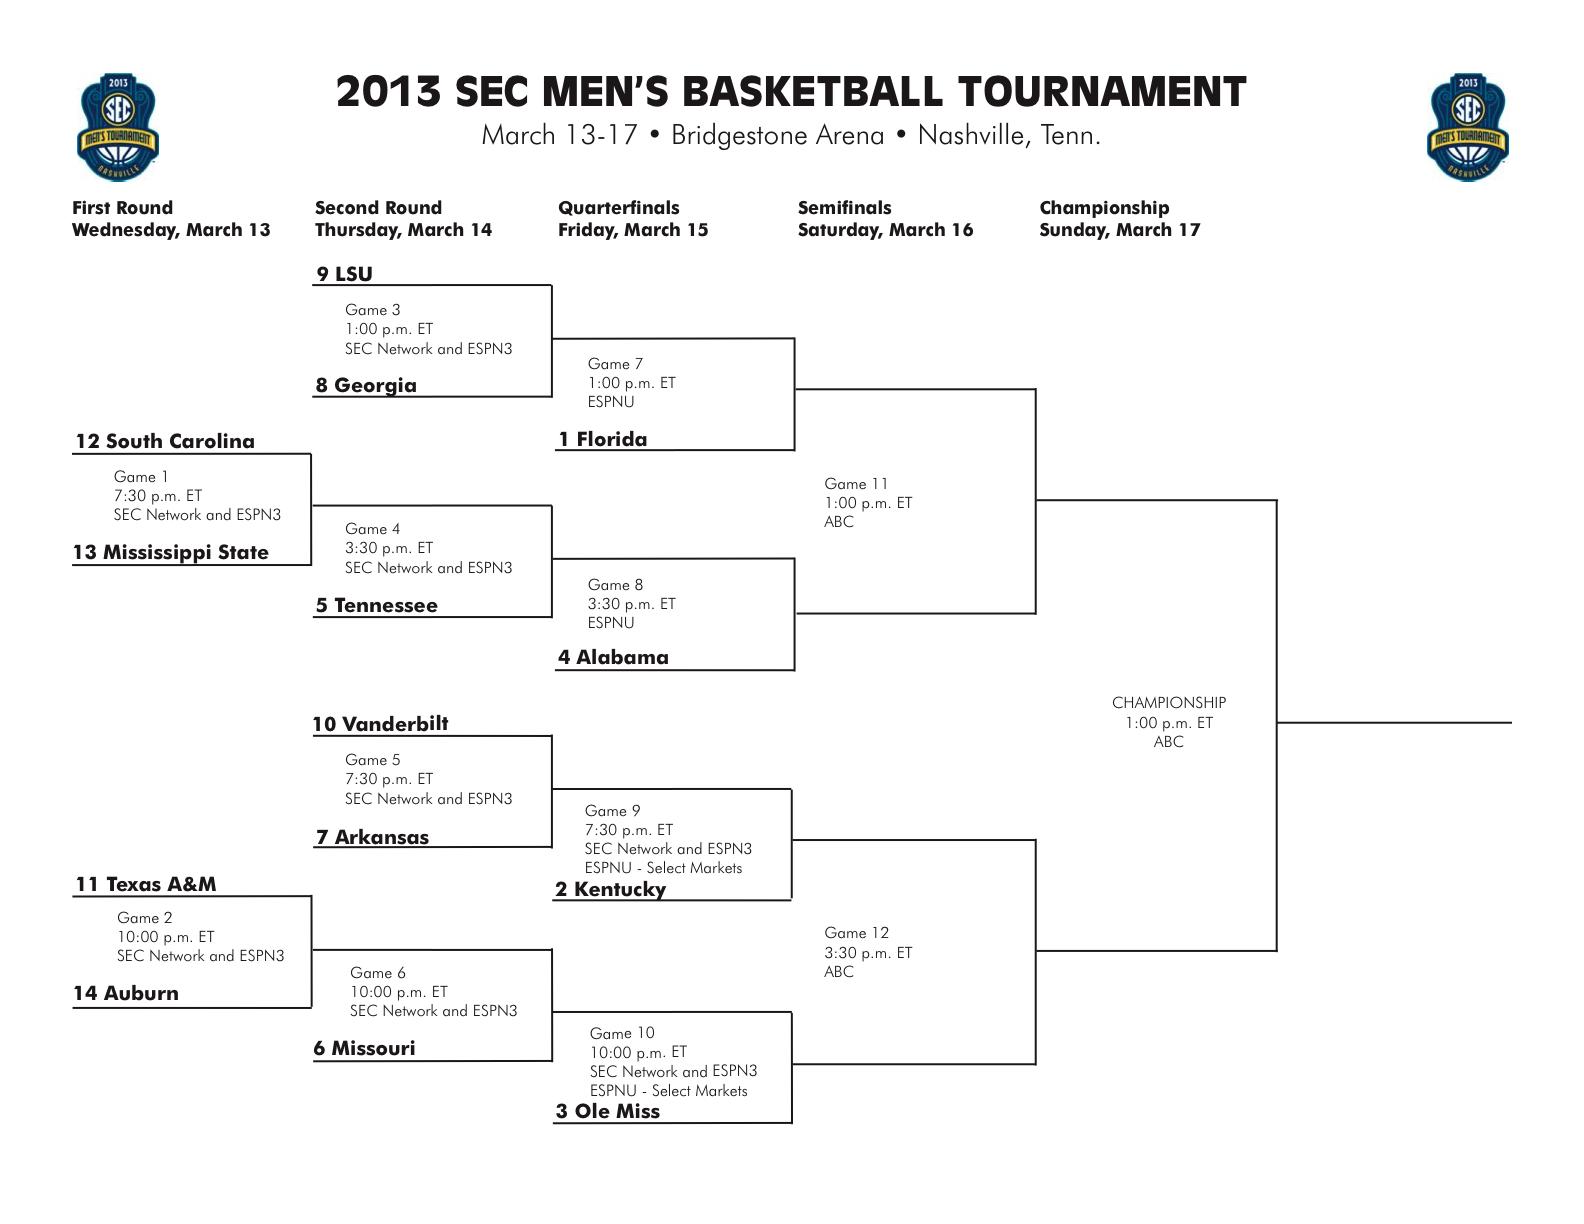 SEC Tournament bracket set